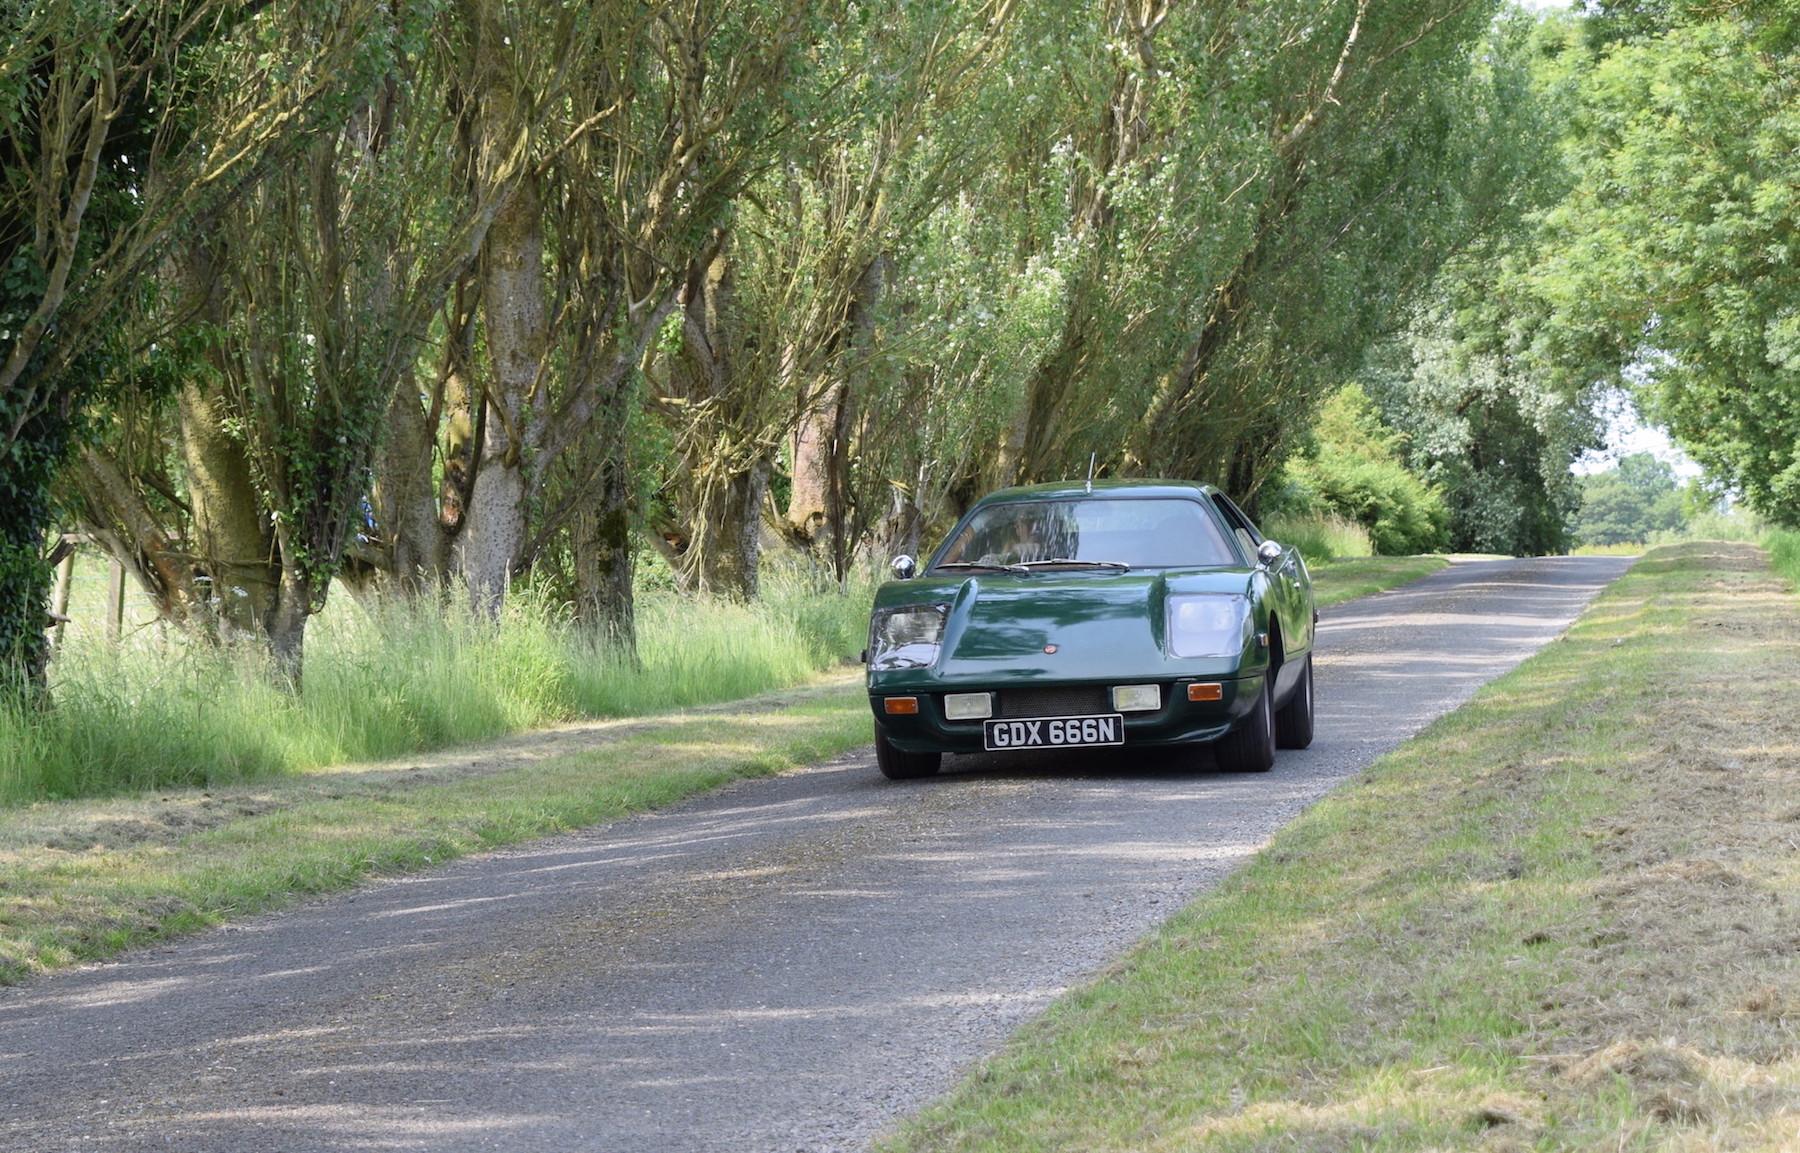 Strada on road